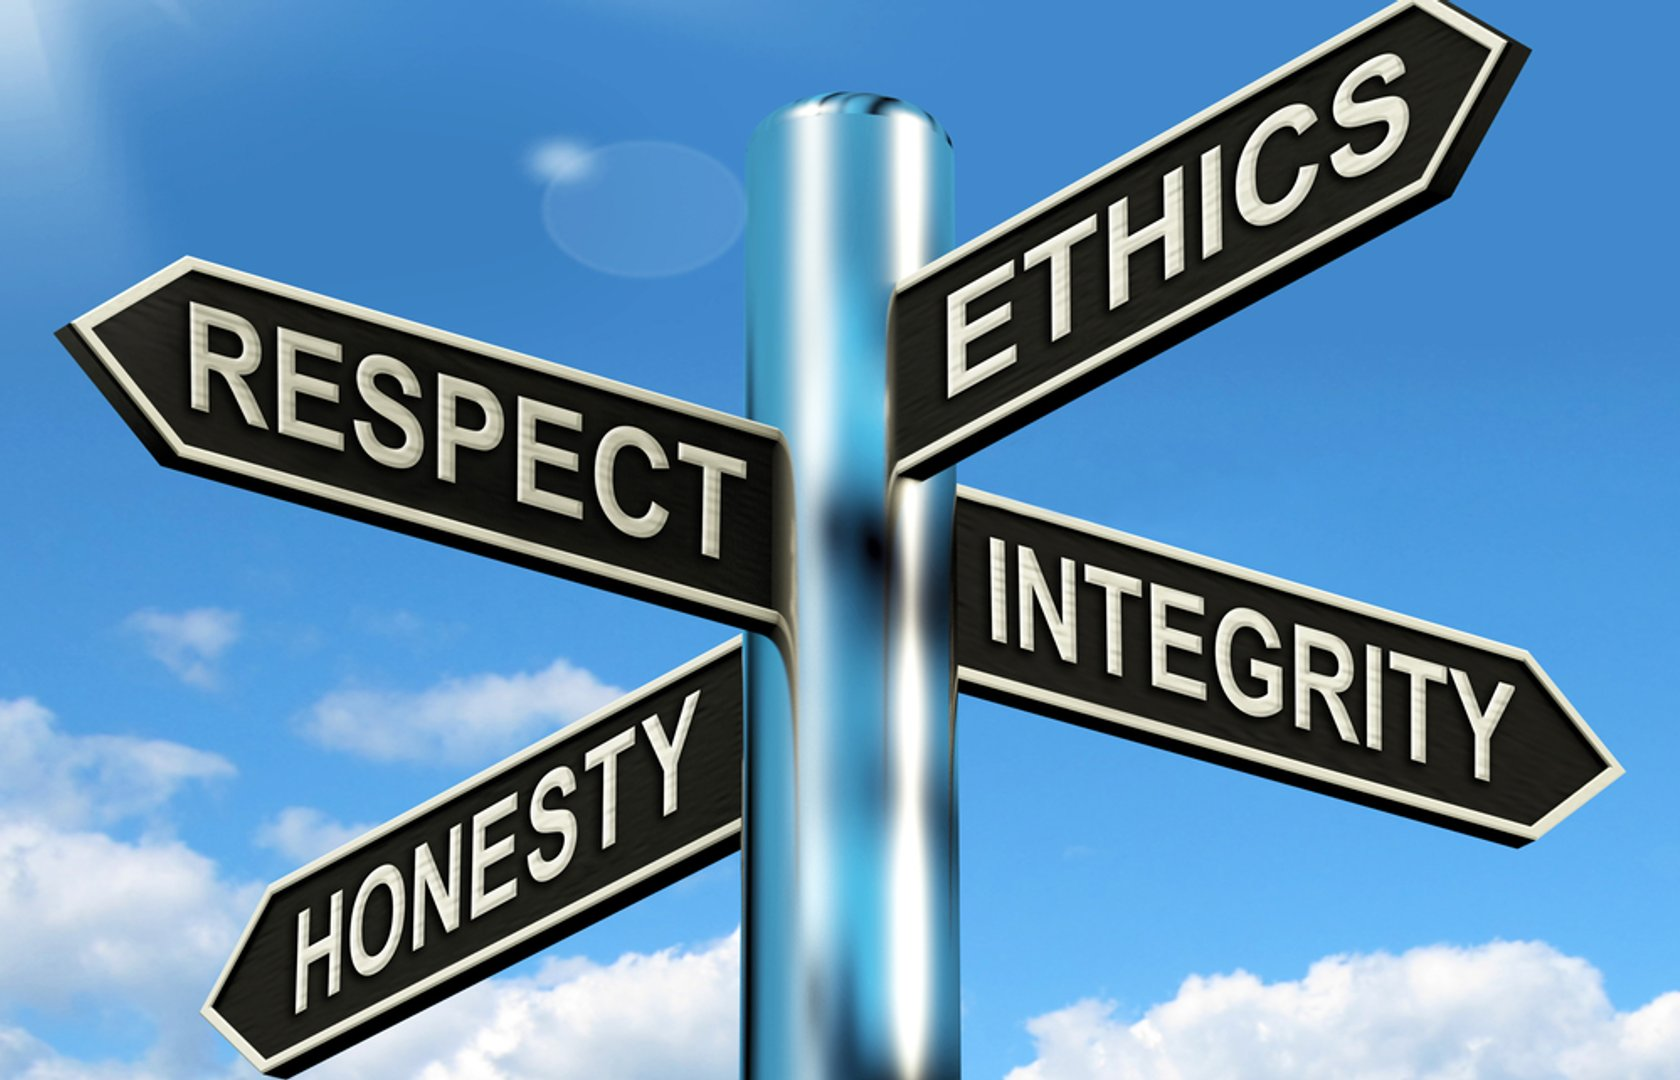 Ethical Marketing, Quality over Quantity